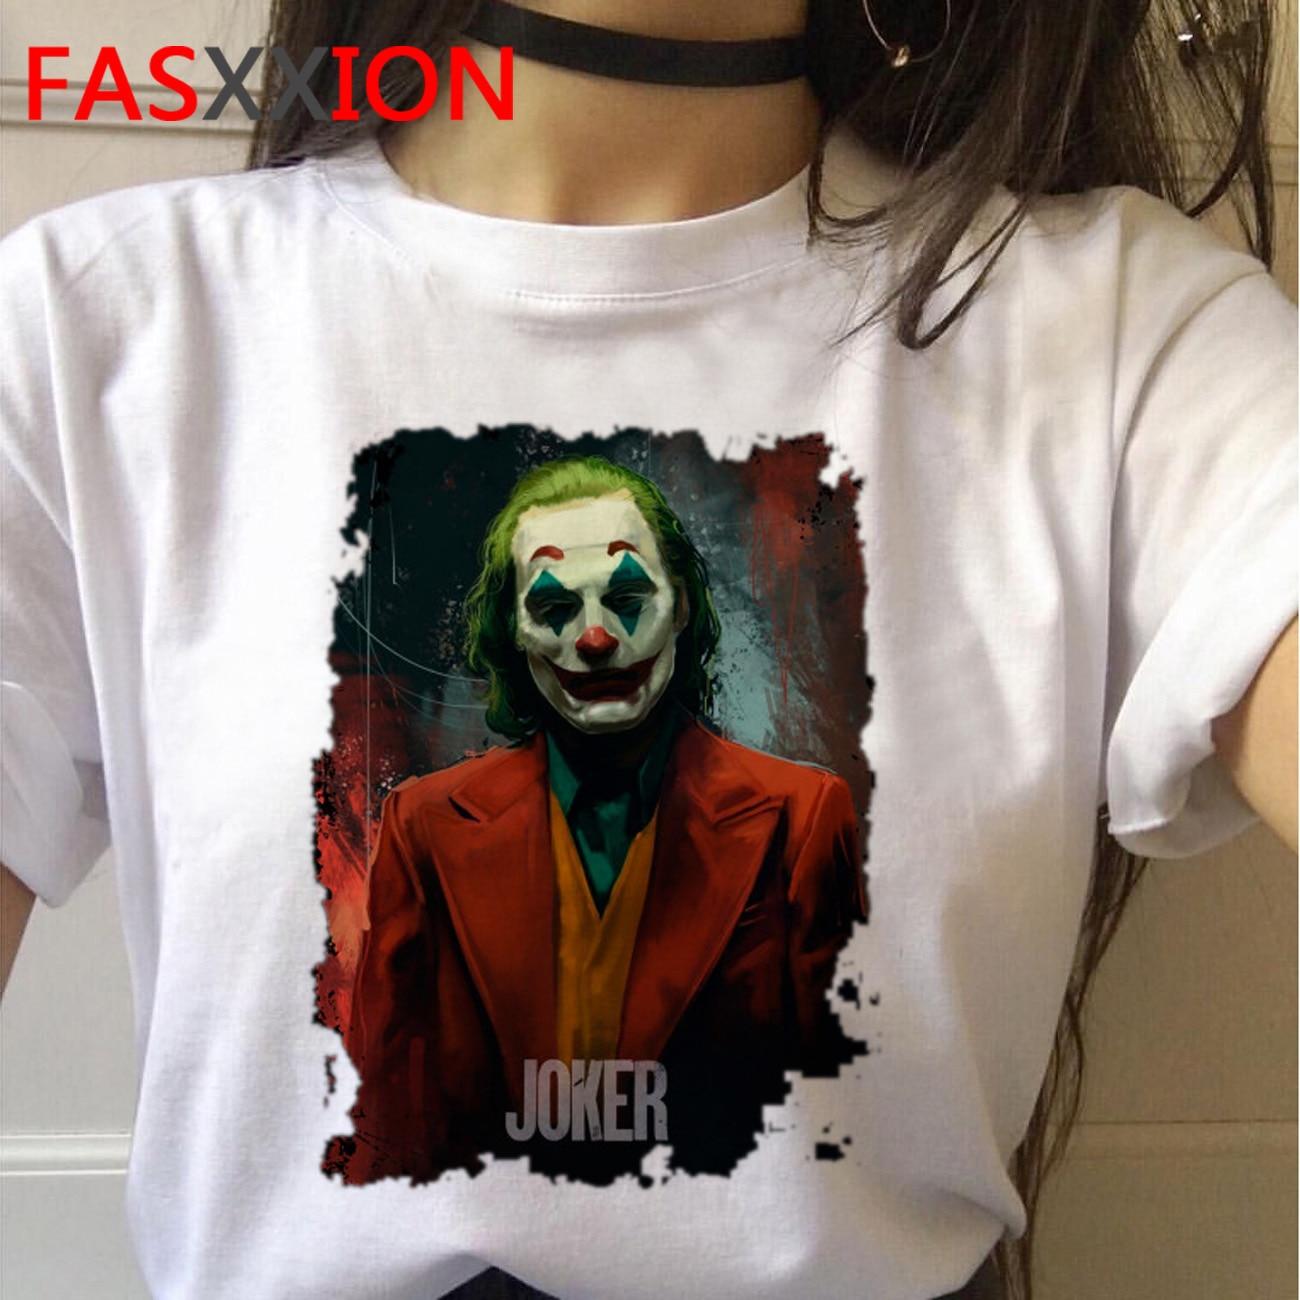 Camiseta de halloween coringa feminino camiseta femme horror plus size streetwear tshirt natal camisetas gráficas